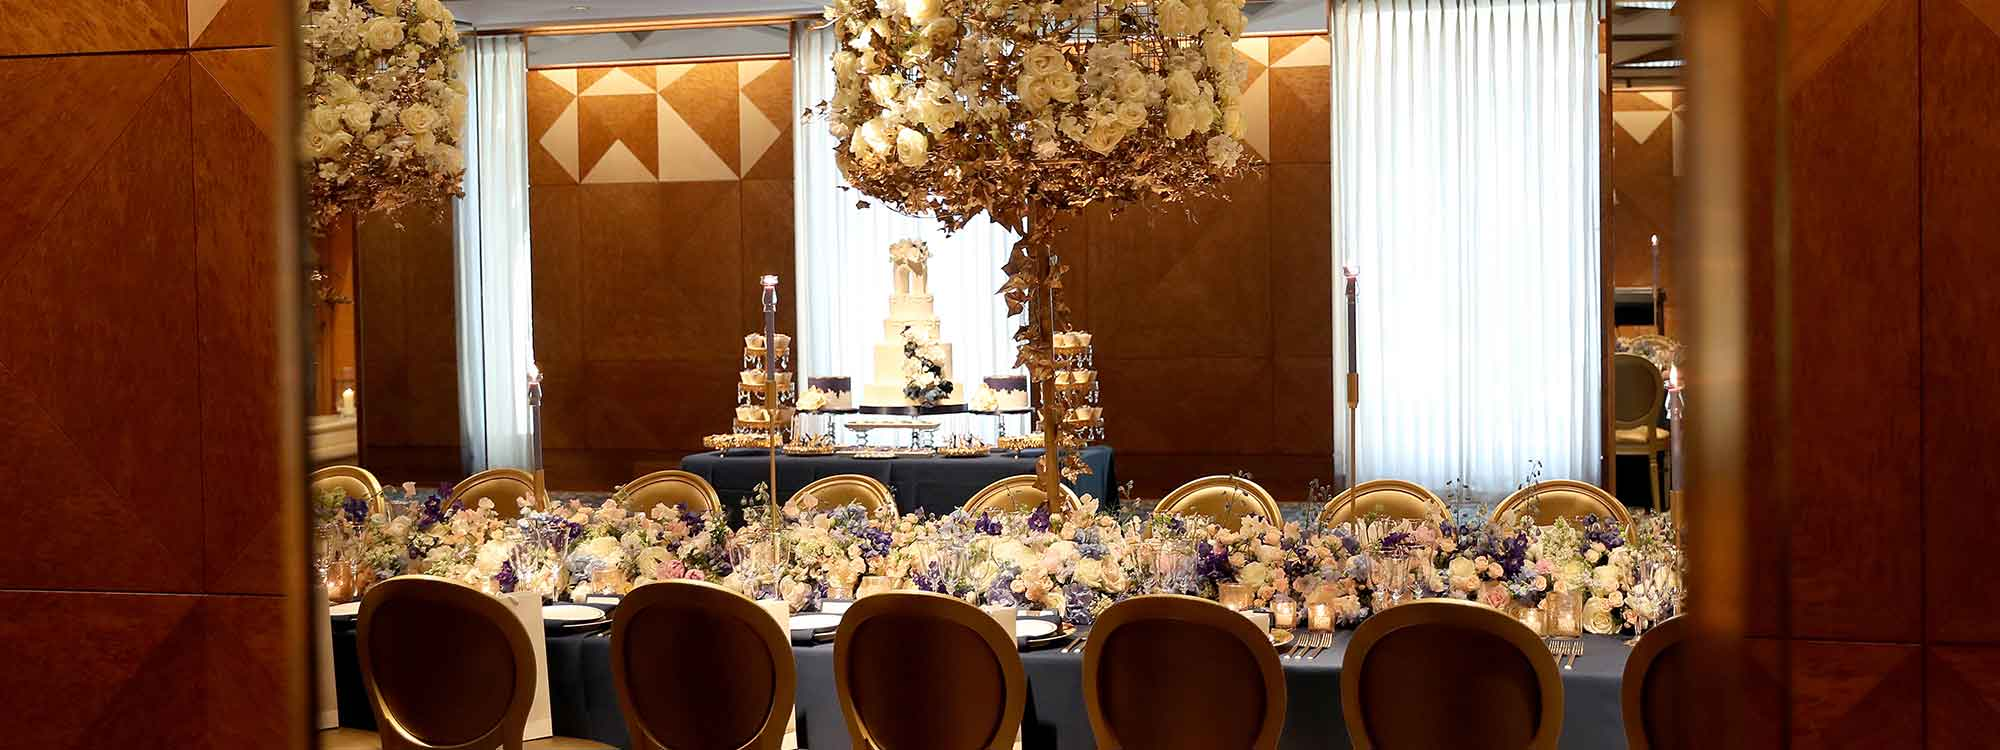 Ballroom prepared for a wedding